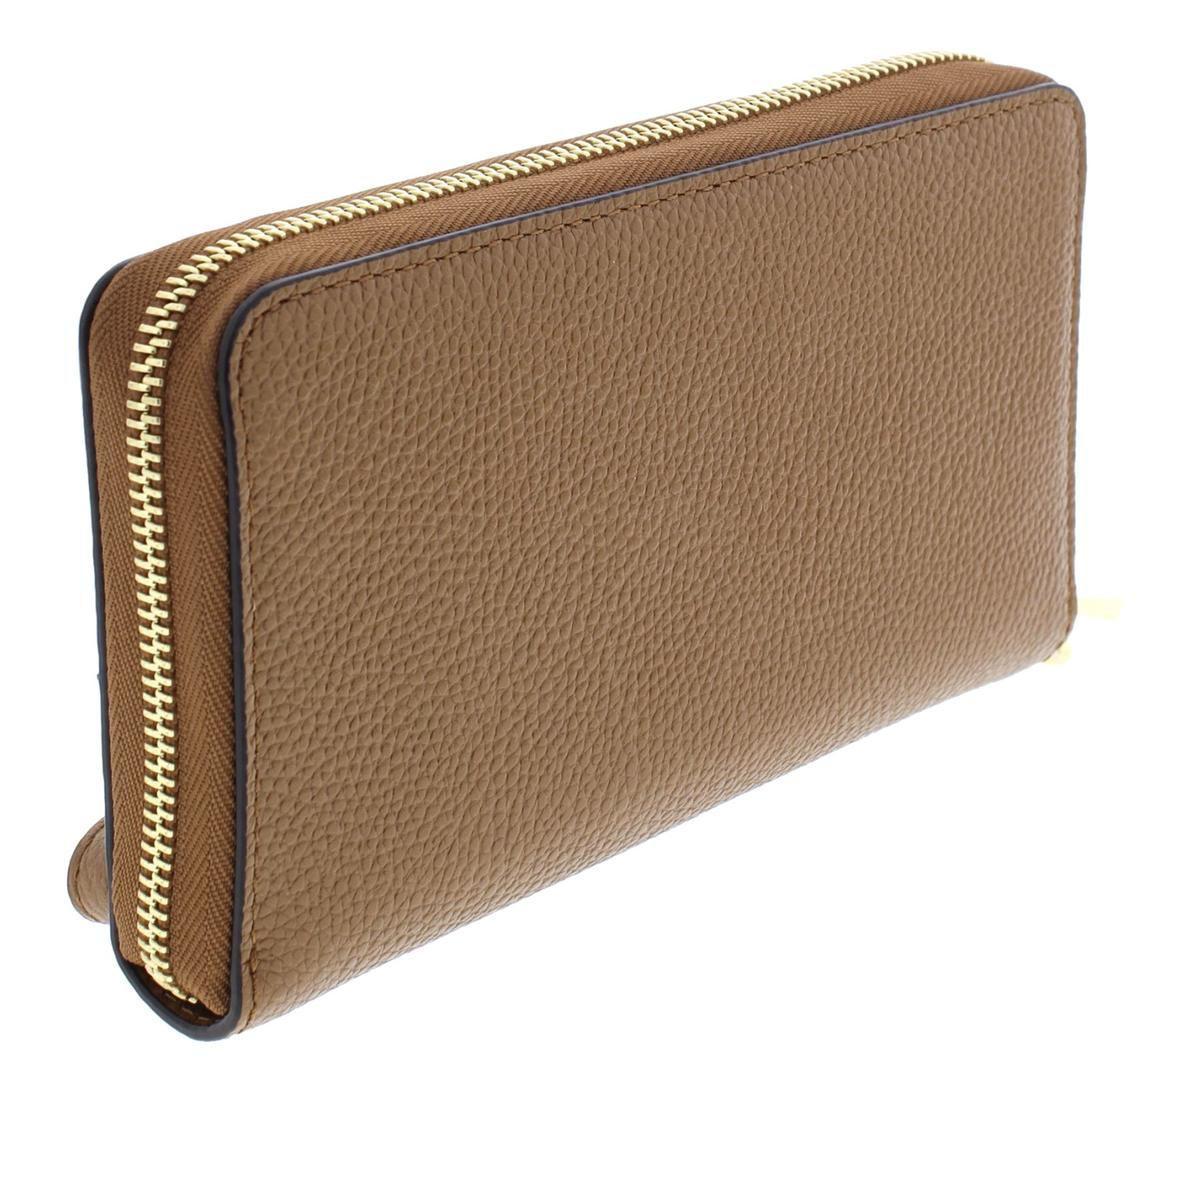 5861cc926af4 MICHAEL Michael Kors - Brown Womens Mercer Leather Multi Function Wristlet  Wallet - Lyst. View fullscreen